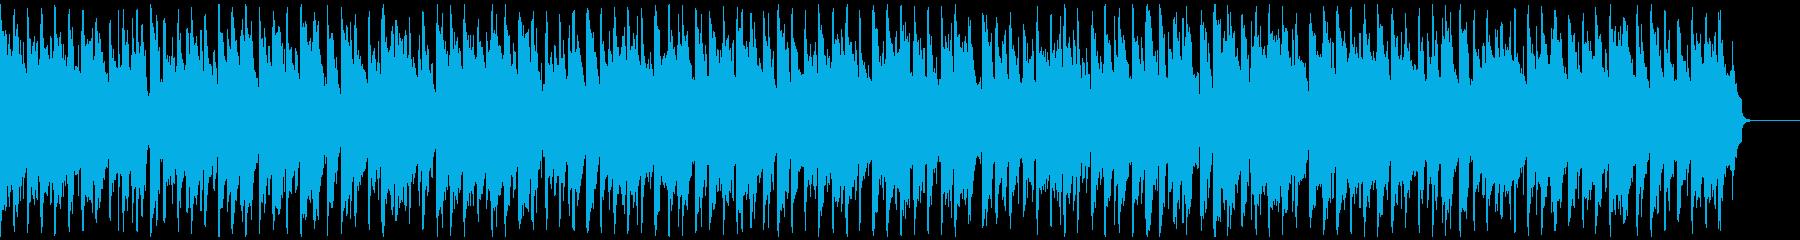 Handel's arrangement for the award ceremony Snare Ver's reproduced waveform